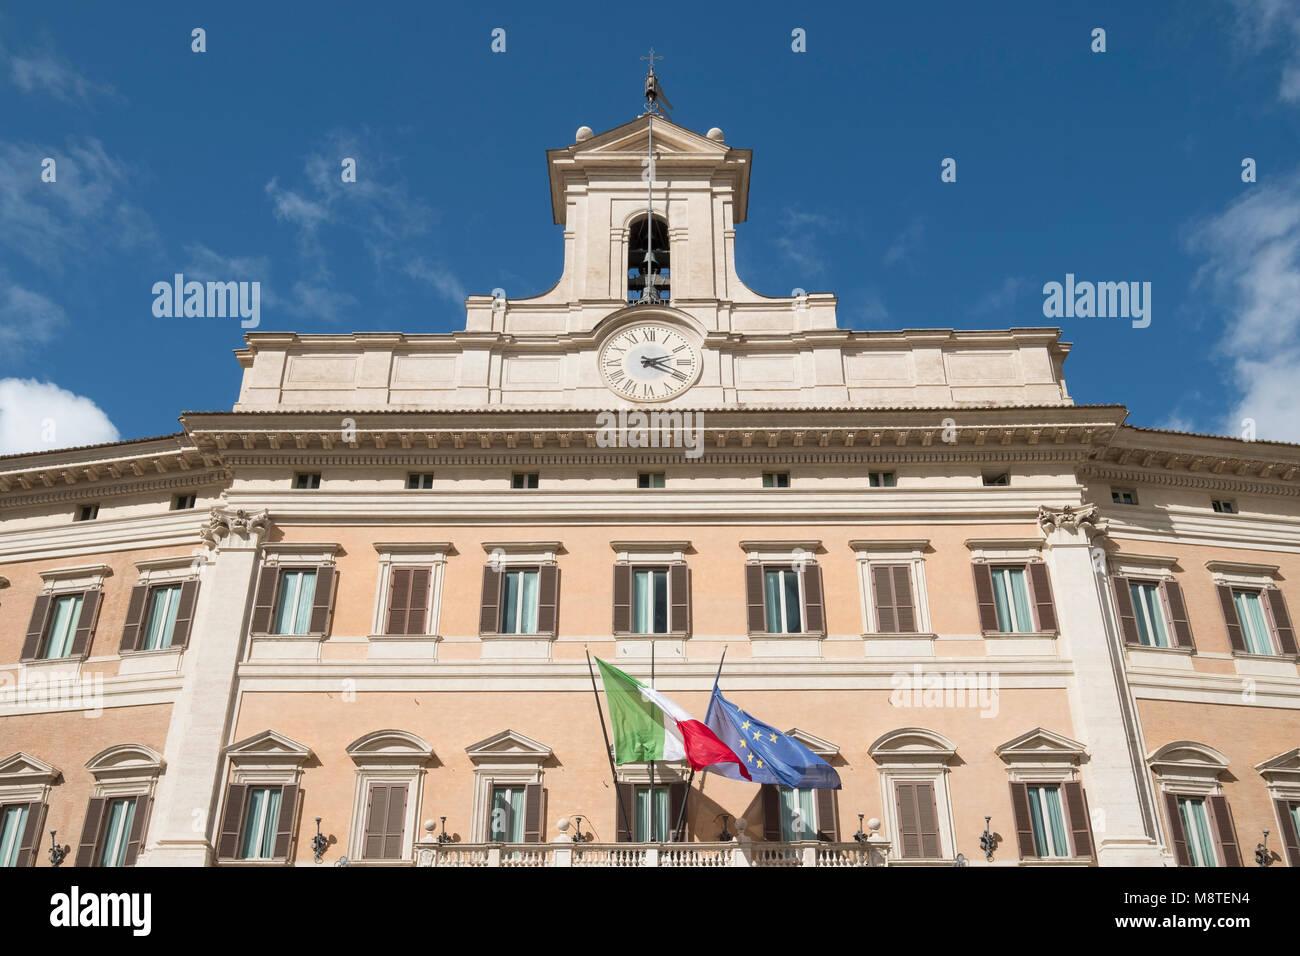 Palazzo Montecitorio in Rome - Seat of the Representative chamber of the Italian parliament. - Stock Image